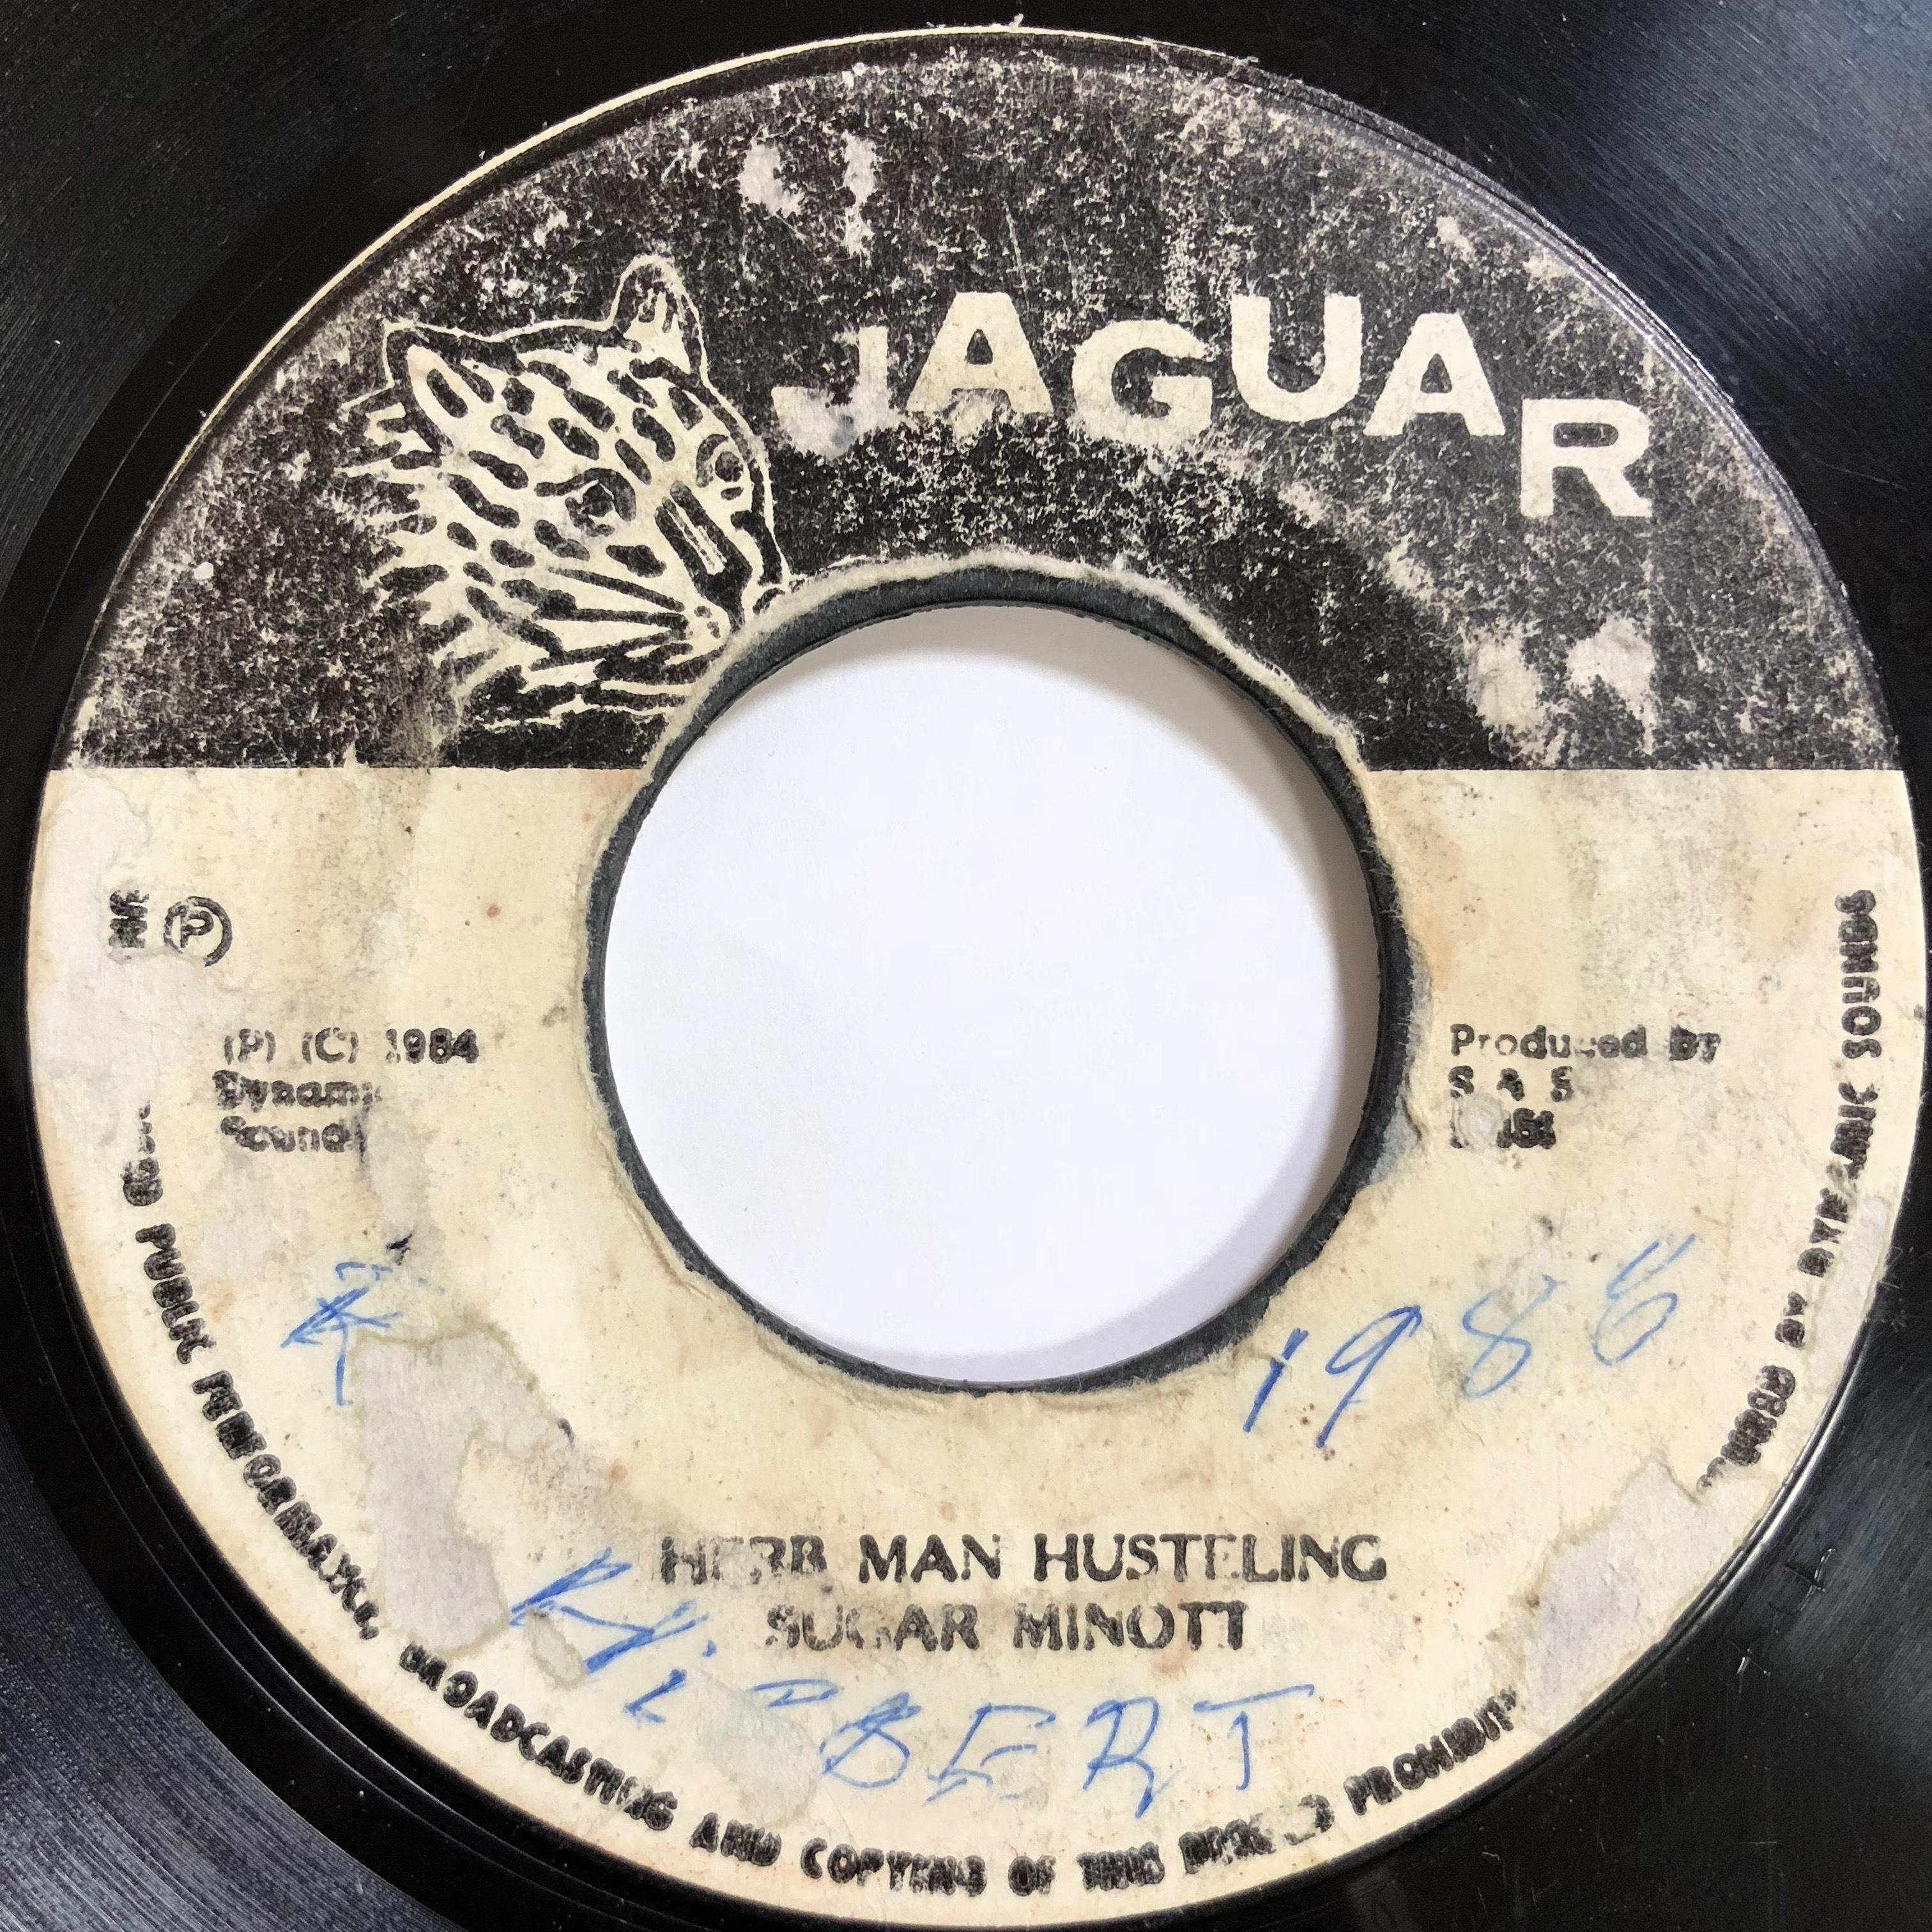 Sugar Minott(シュガーマイノット) - Herbman Hustling【7'】